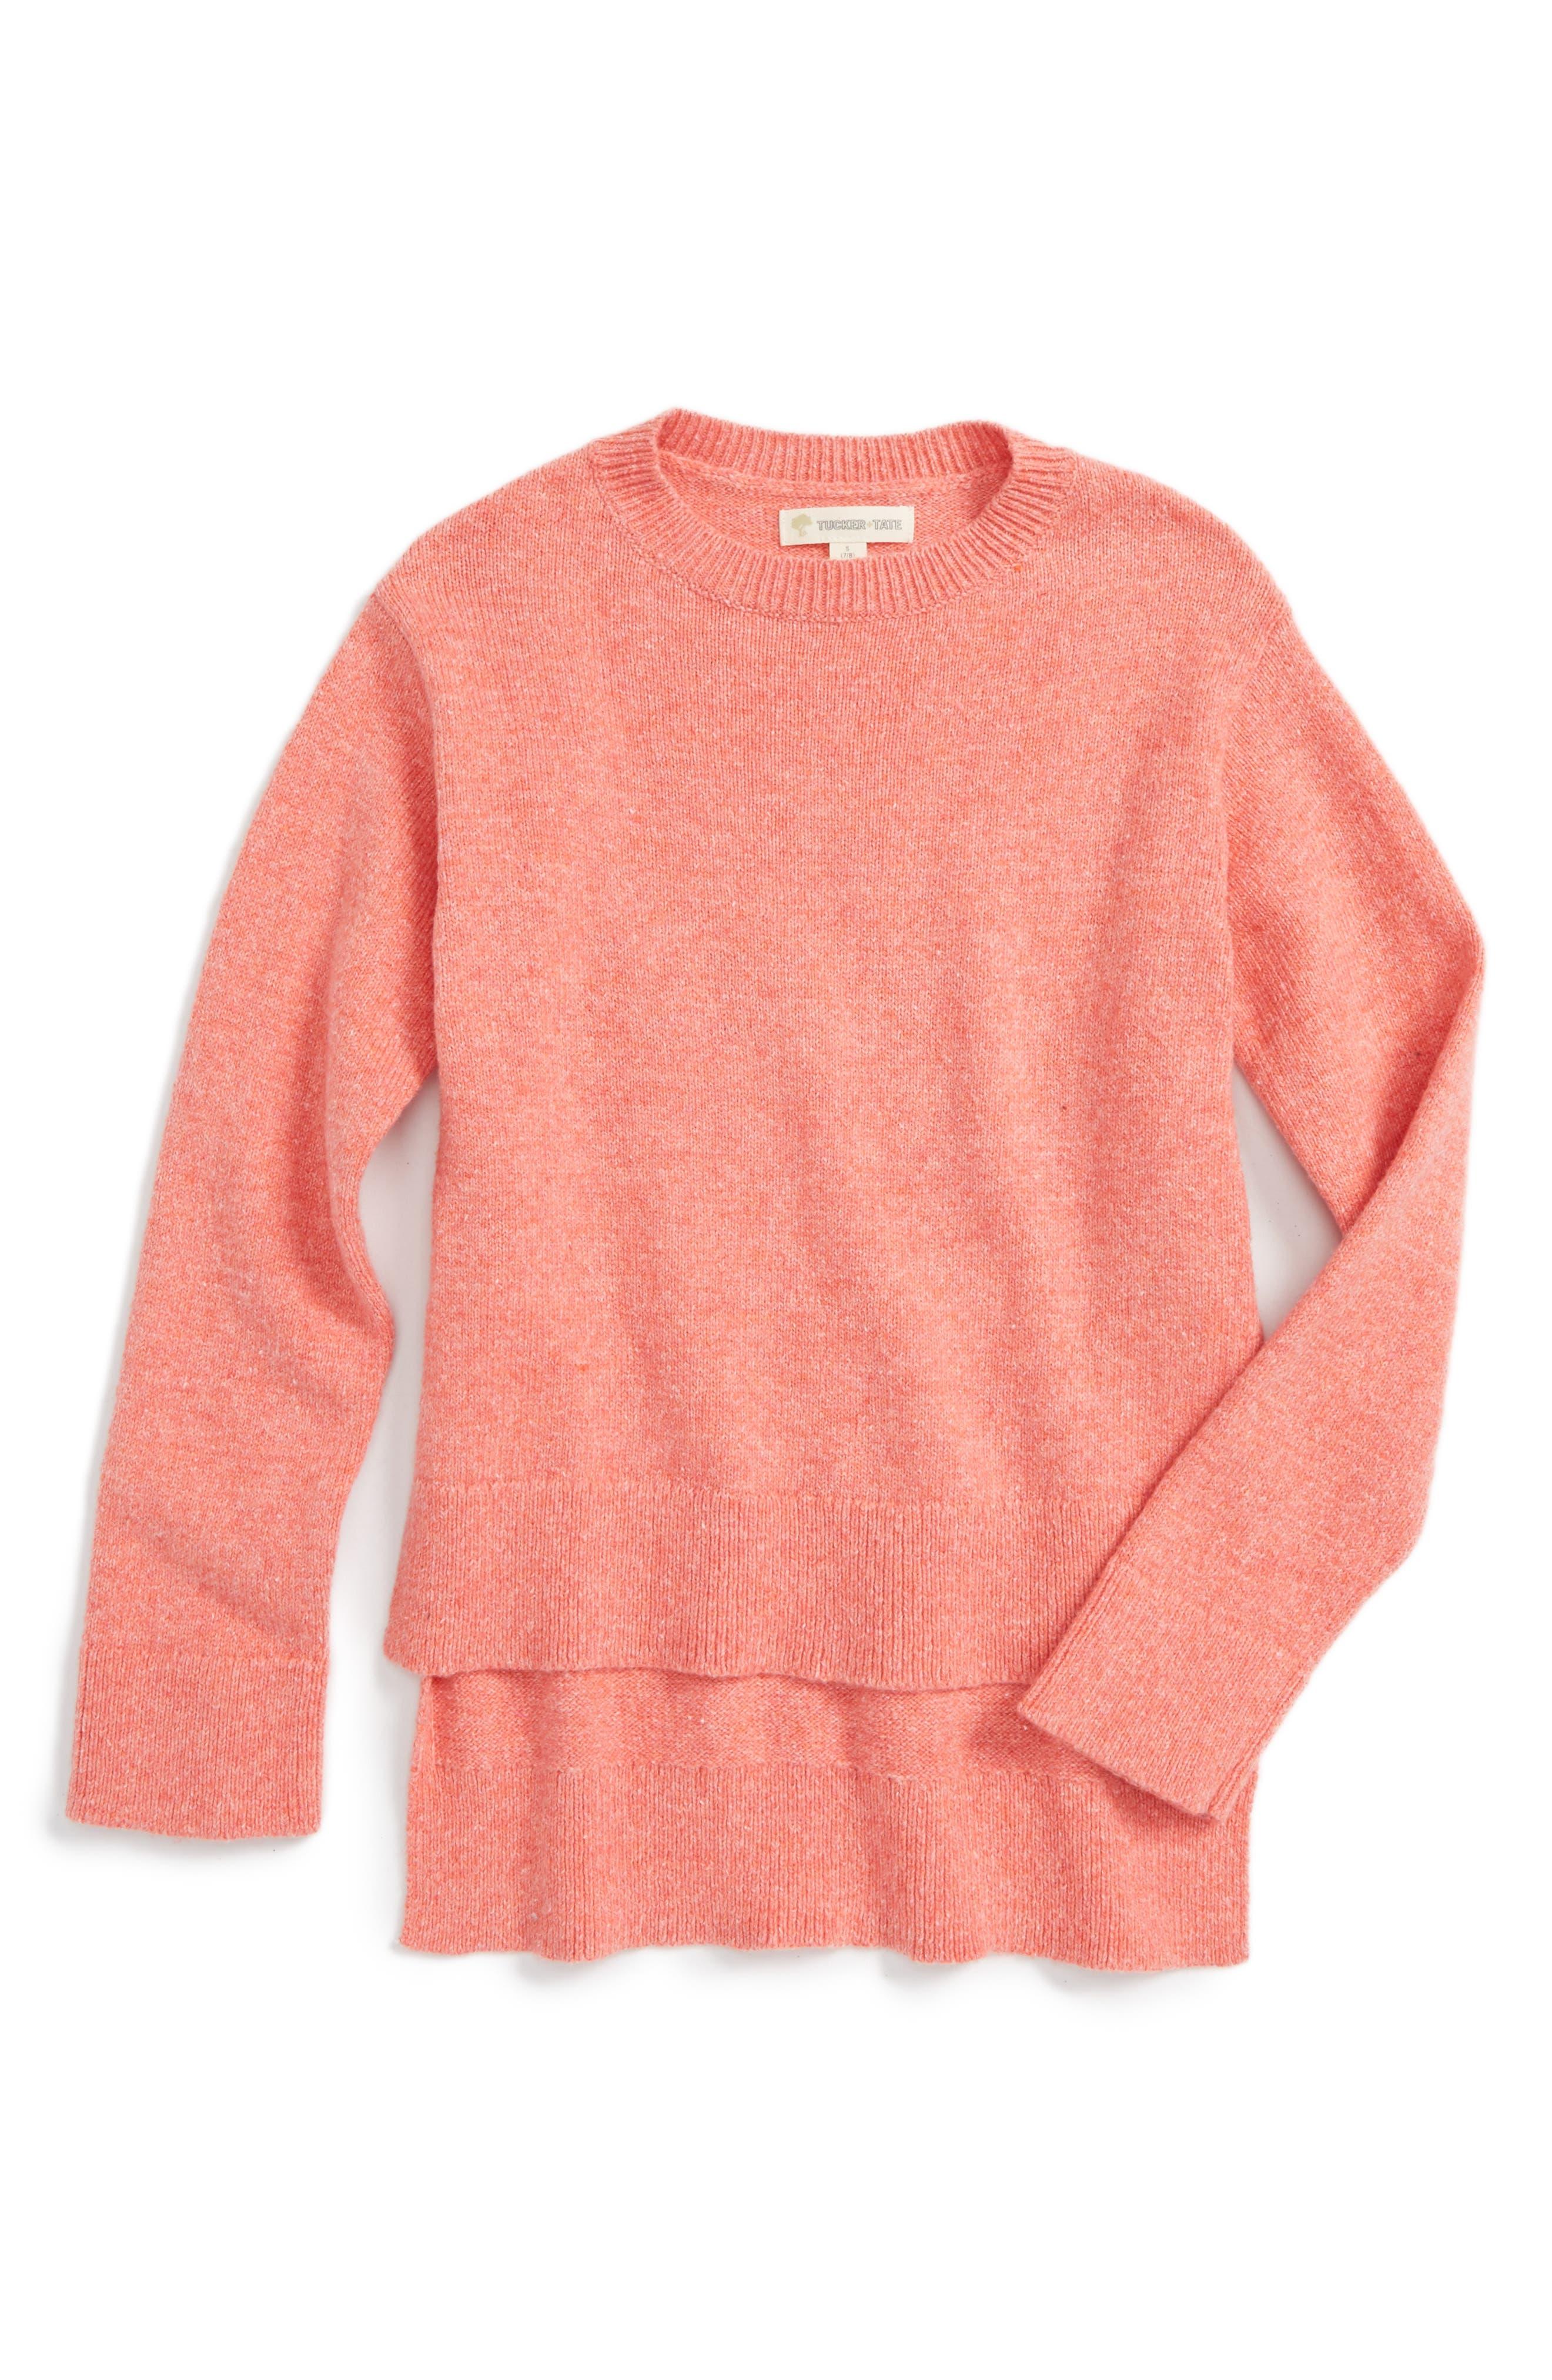 Main Image - Tucker + Tate High/Low Sweater (Big Girls)